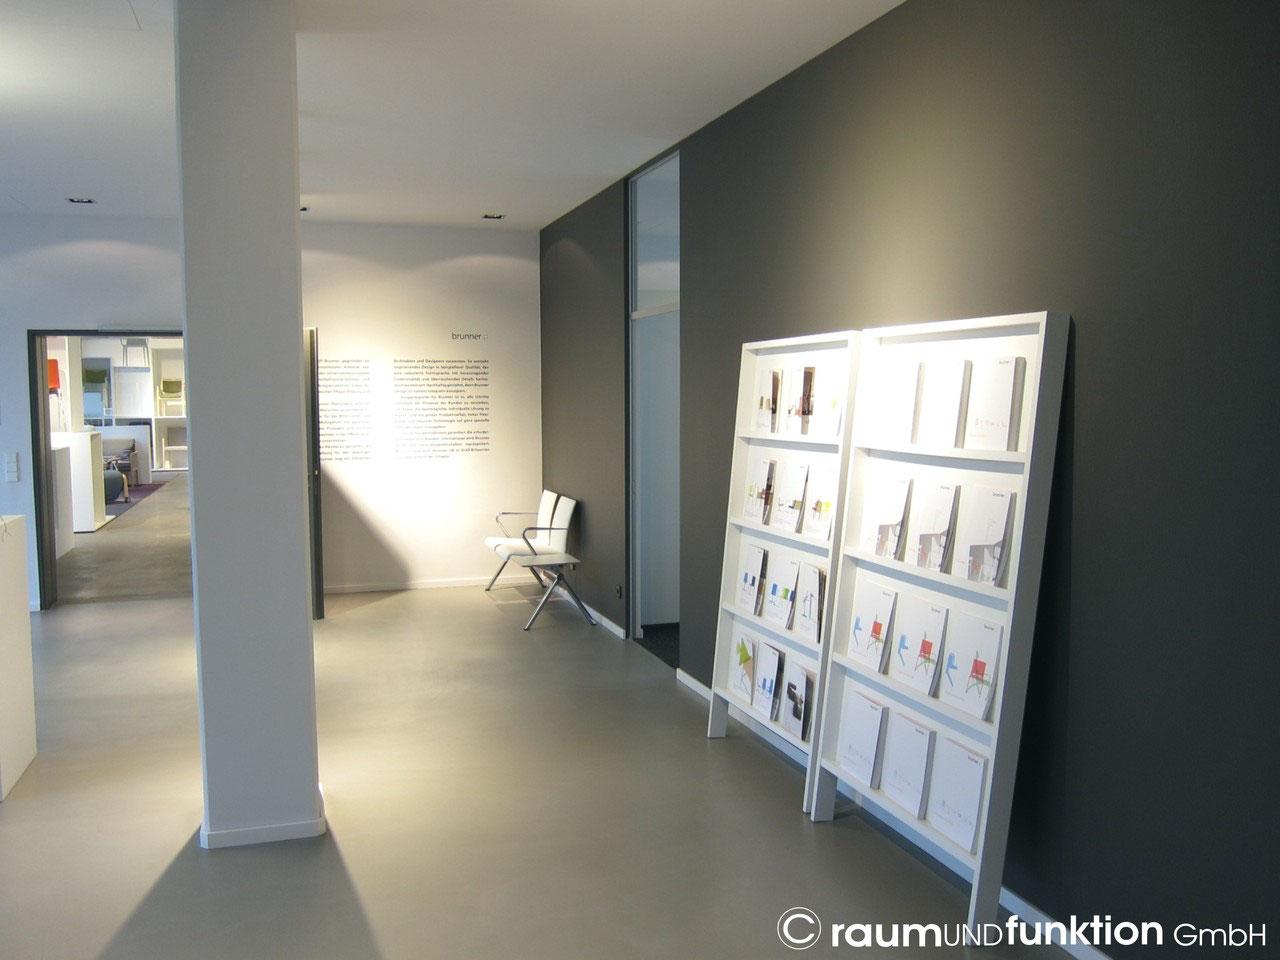 brunner group gmbh b roplanung raumundfunktion gmbh. Black Bedroom Furniture Sets. Home Design Ideas